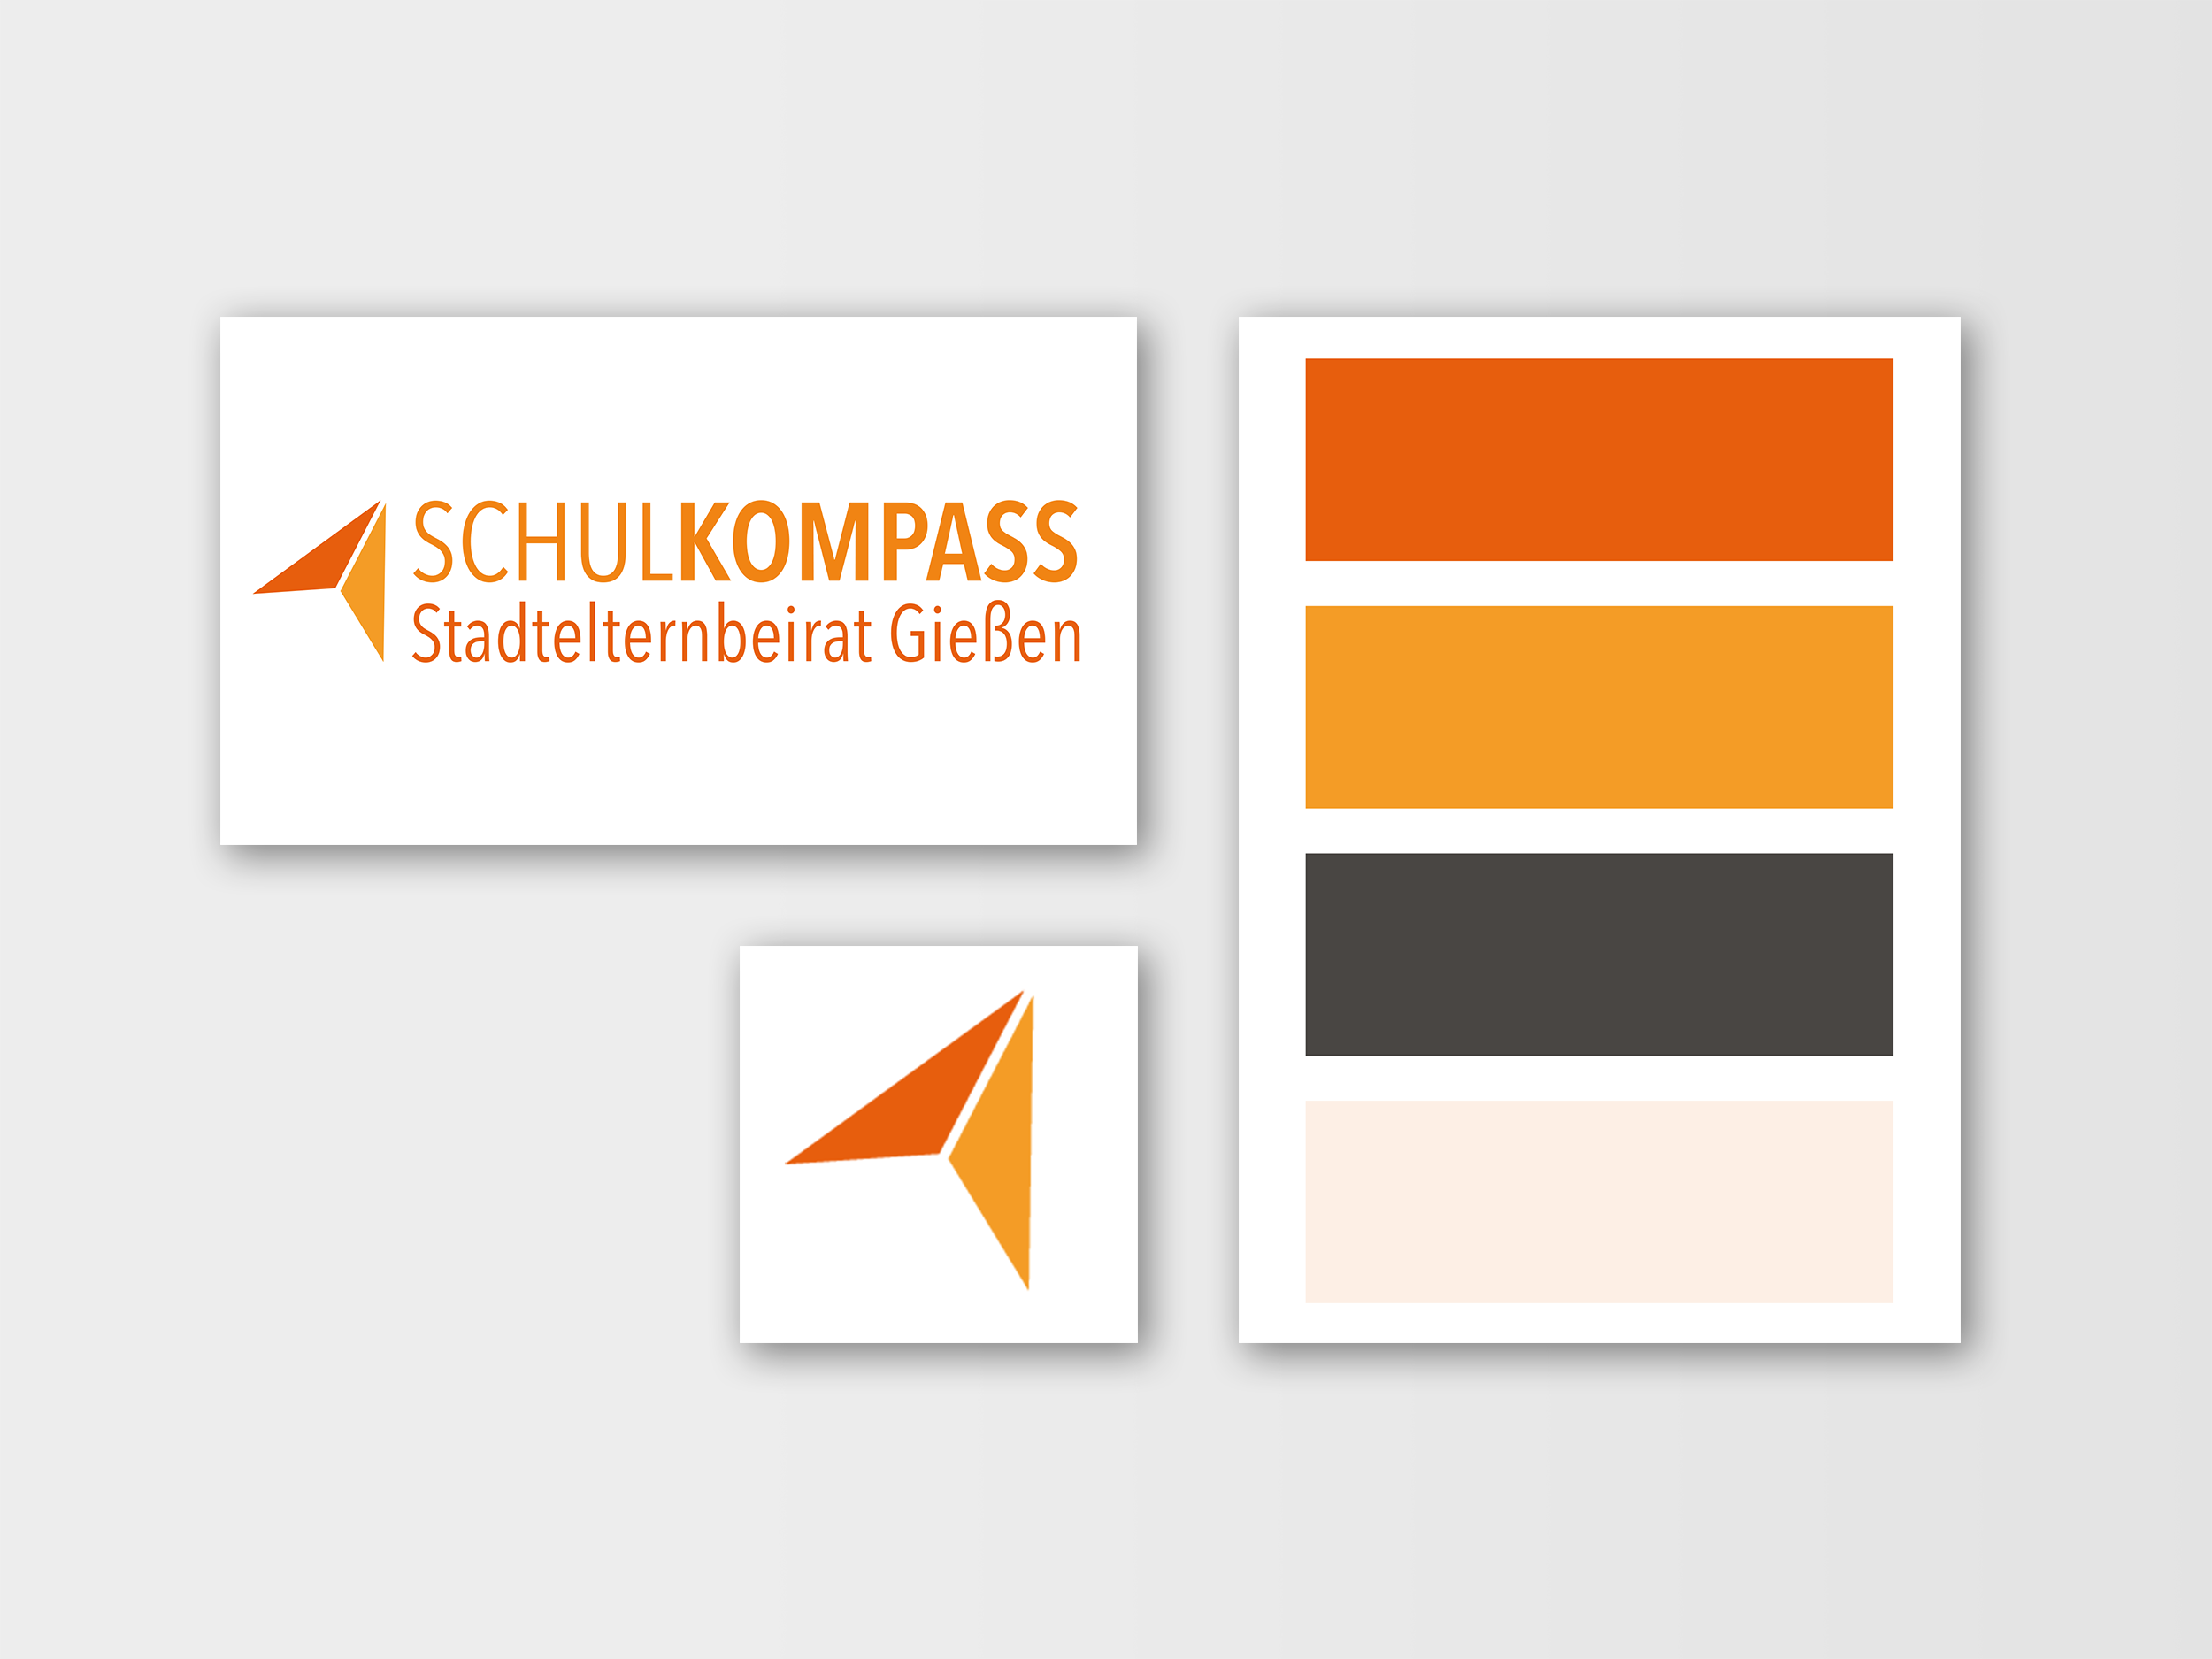 Schulkompass Corporate Design